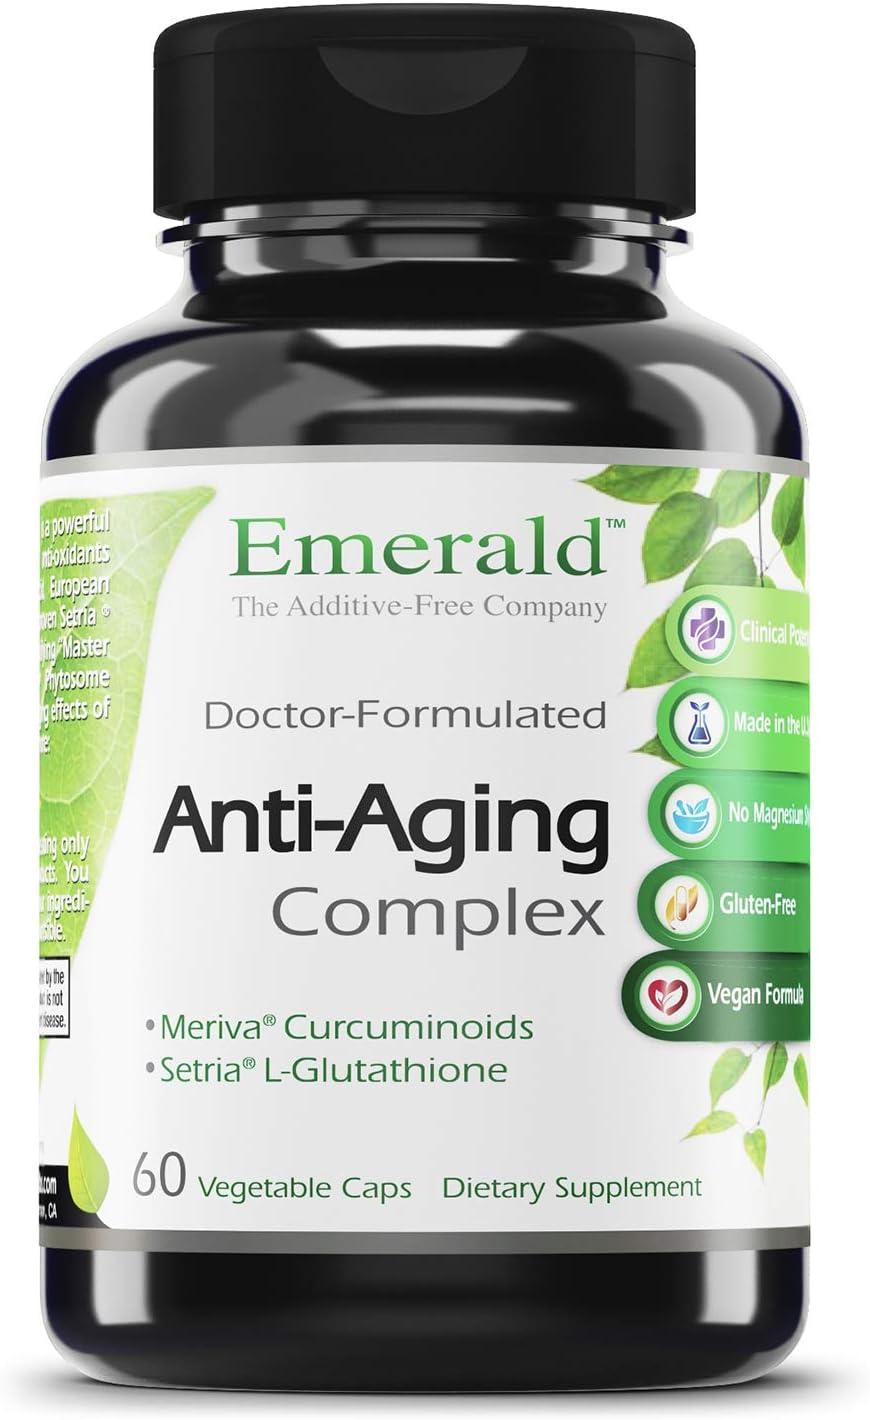 Anti-Aging Complex - with L-Glutathione, Resveratrol, CoQ10, R-Alpha Lipoic Acid, Meriva, Pomegranate, & More - Emerald Labs (Rainforest) - 60 Vegetable Capsules